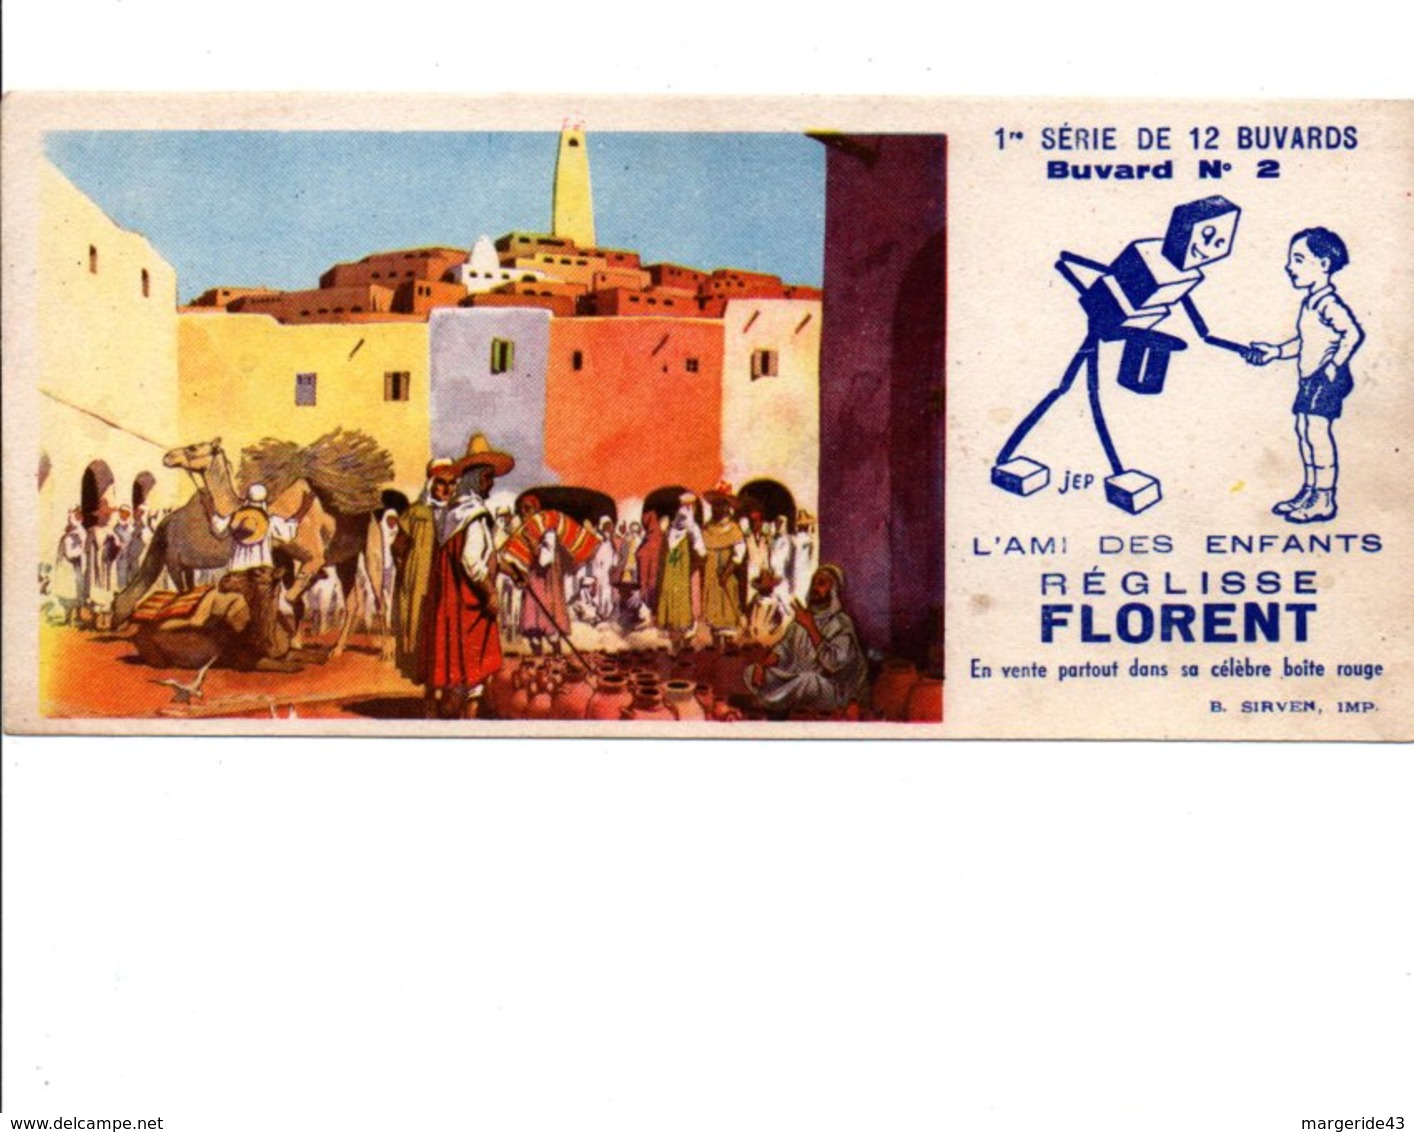 BUVARD REGLISSE FLORENT - Blotters